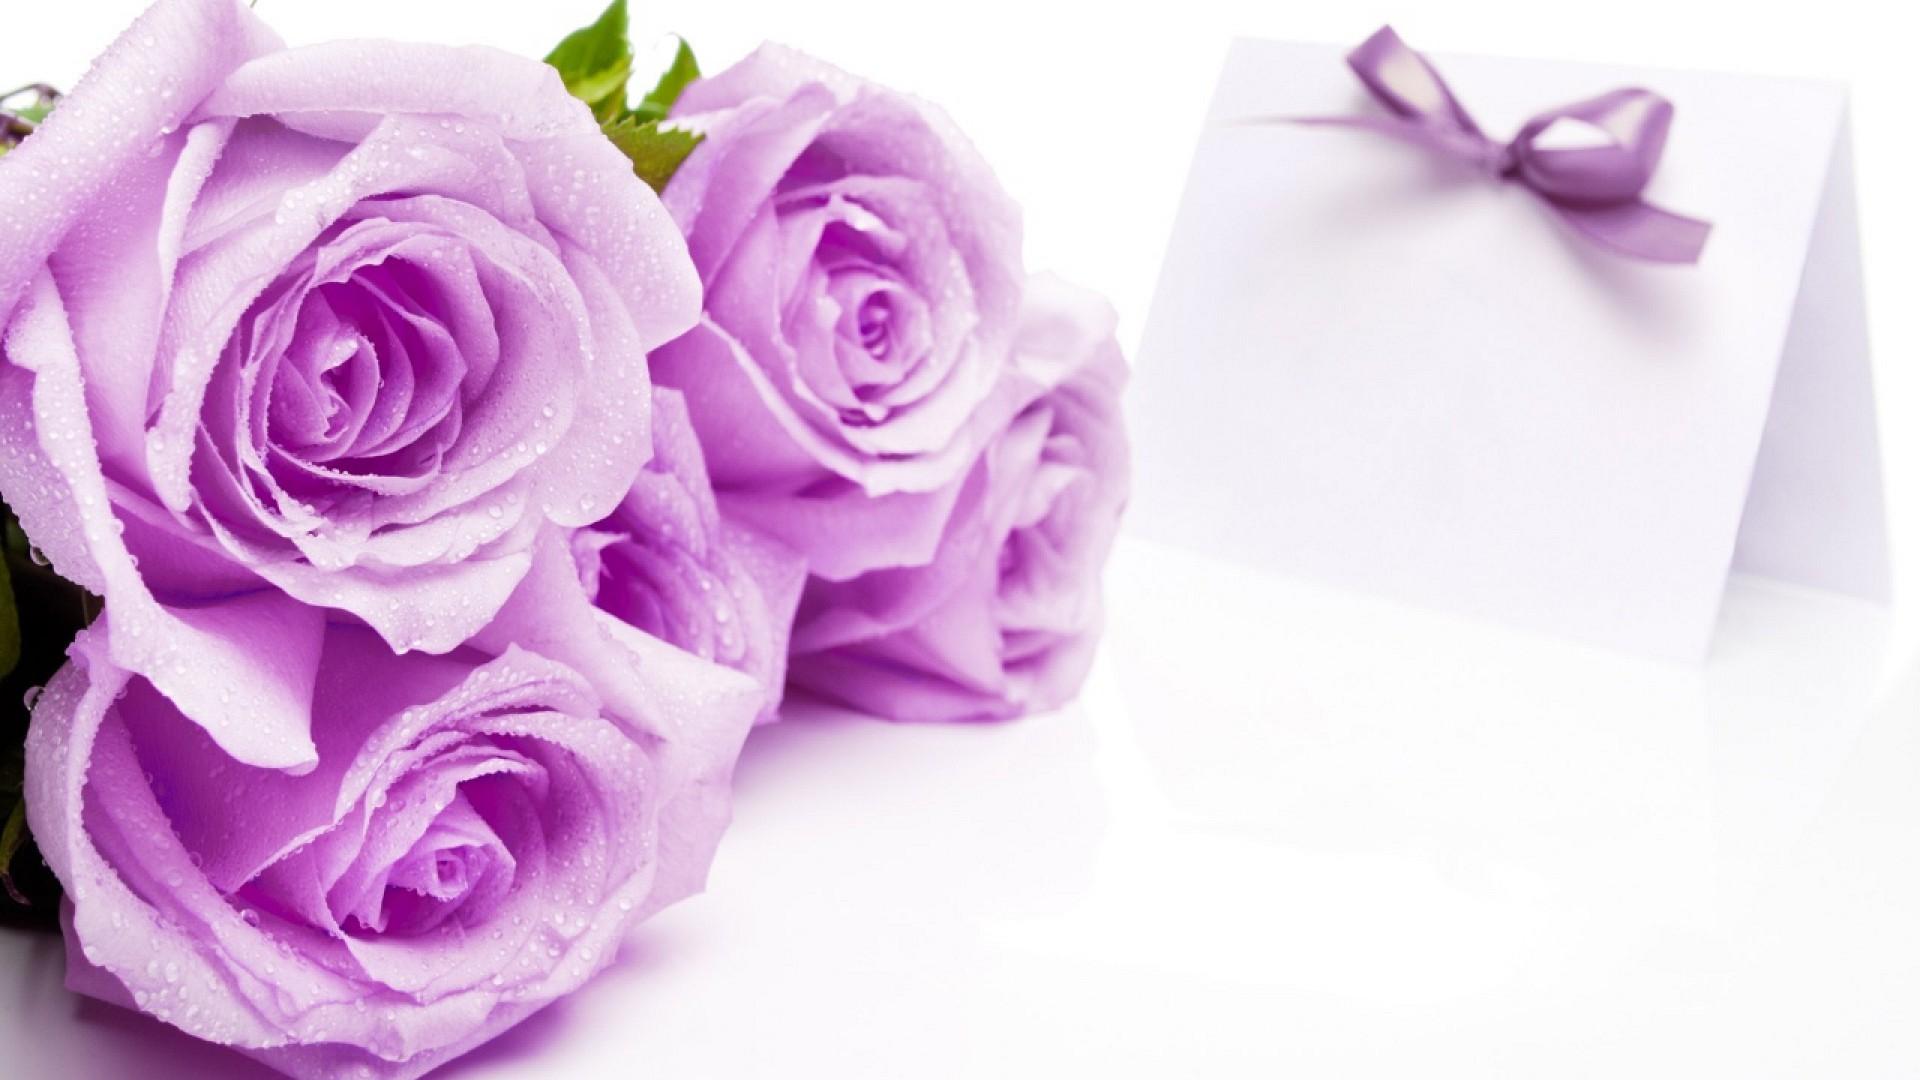 44 Wedding Backgrounds ① Download Free Beautiful Full Hd